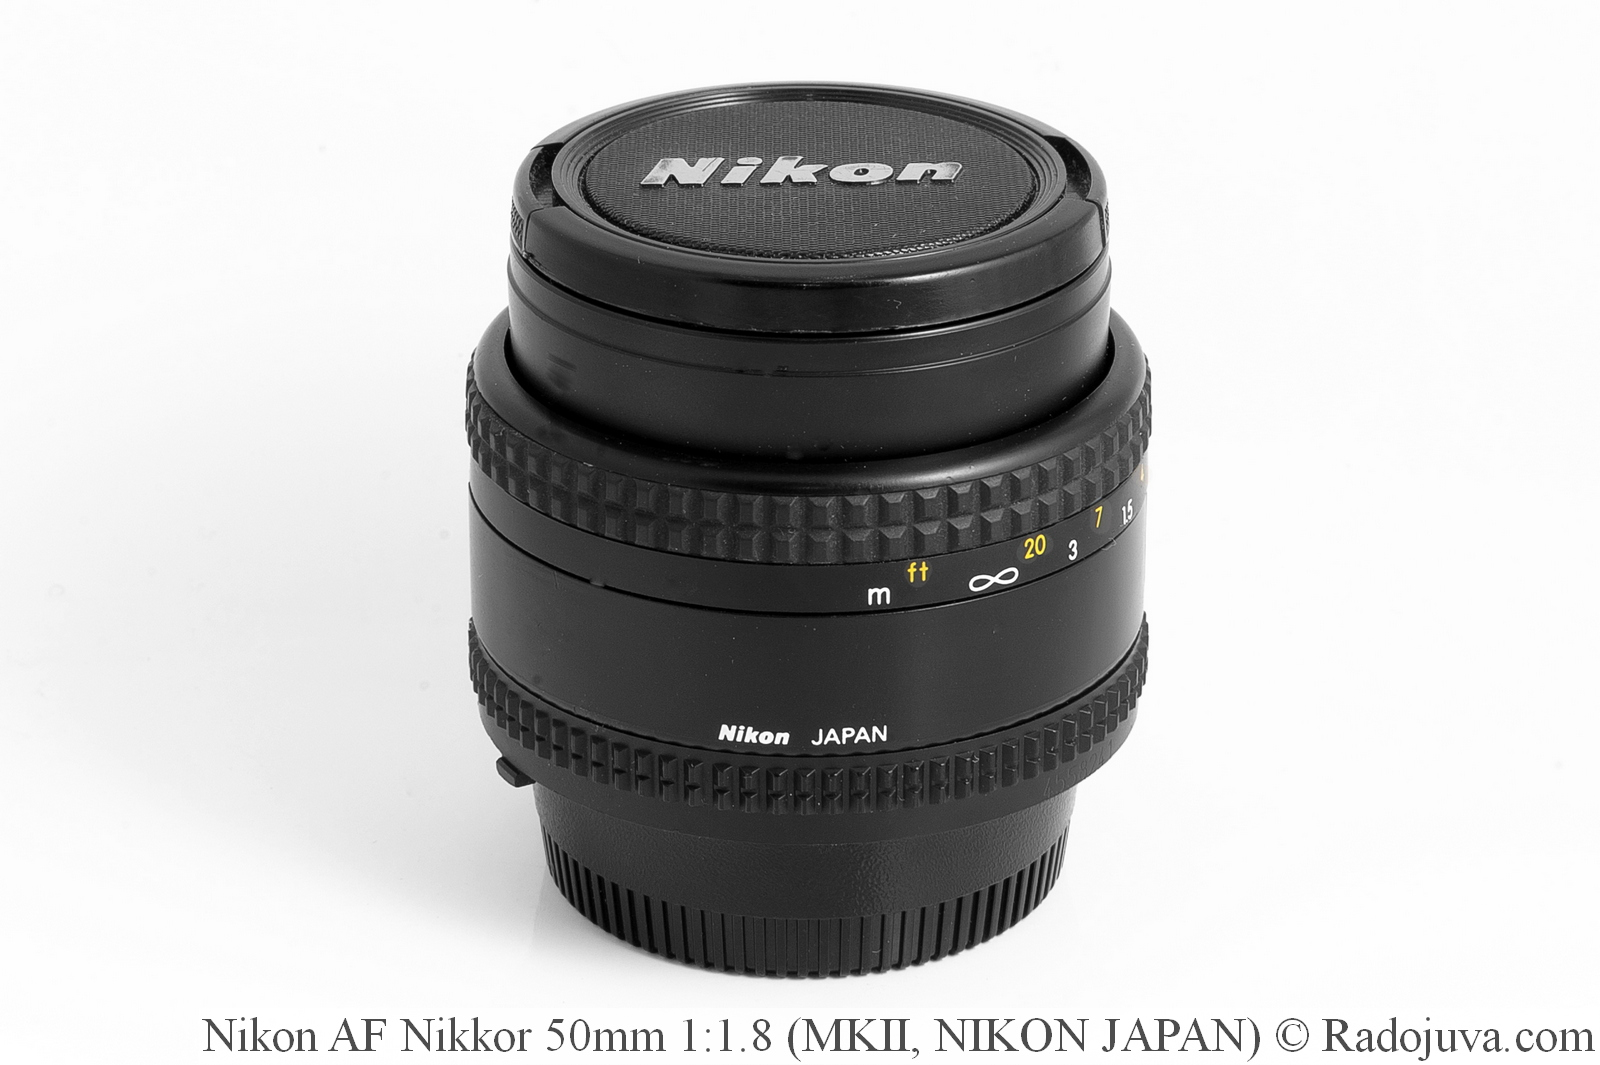 Nikon AF Nikkor 50mm 1:1.8, версия MKII, NJ (NIKON JAPAN)